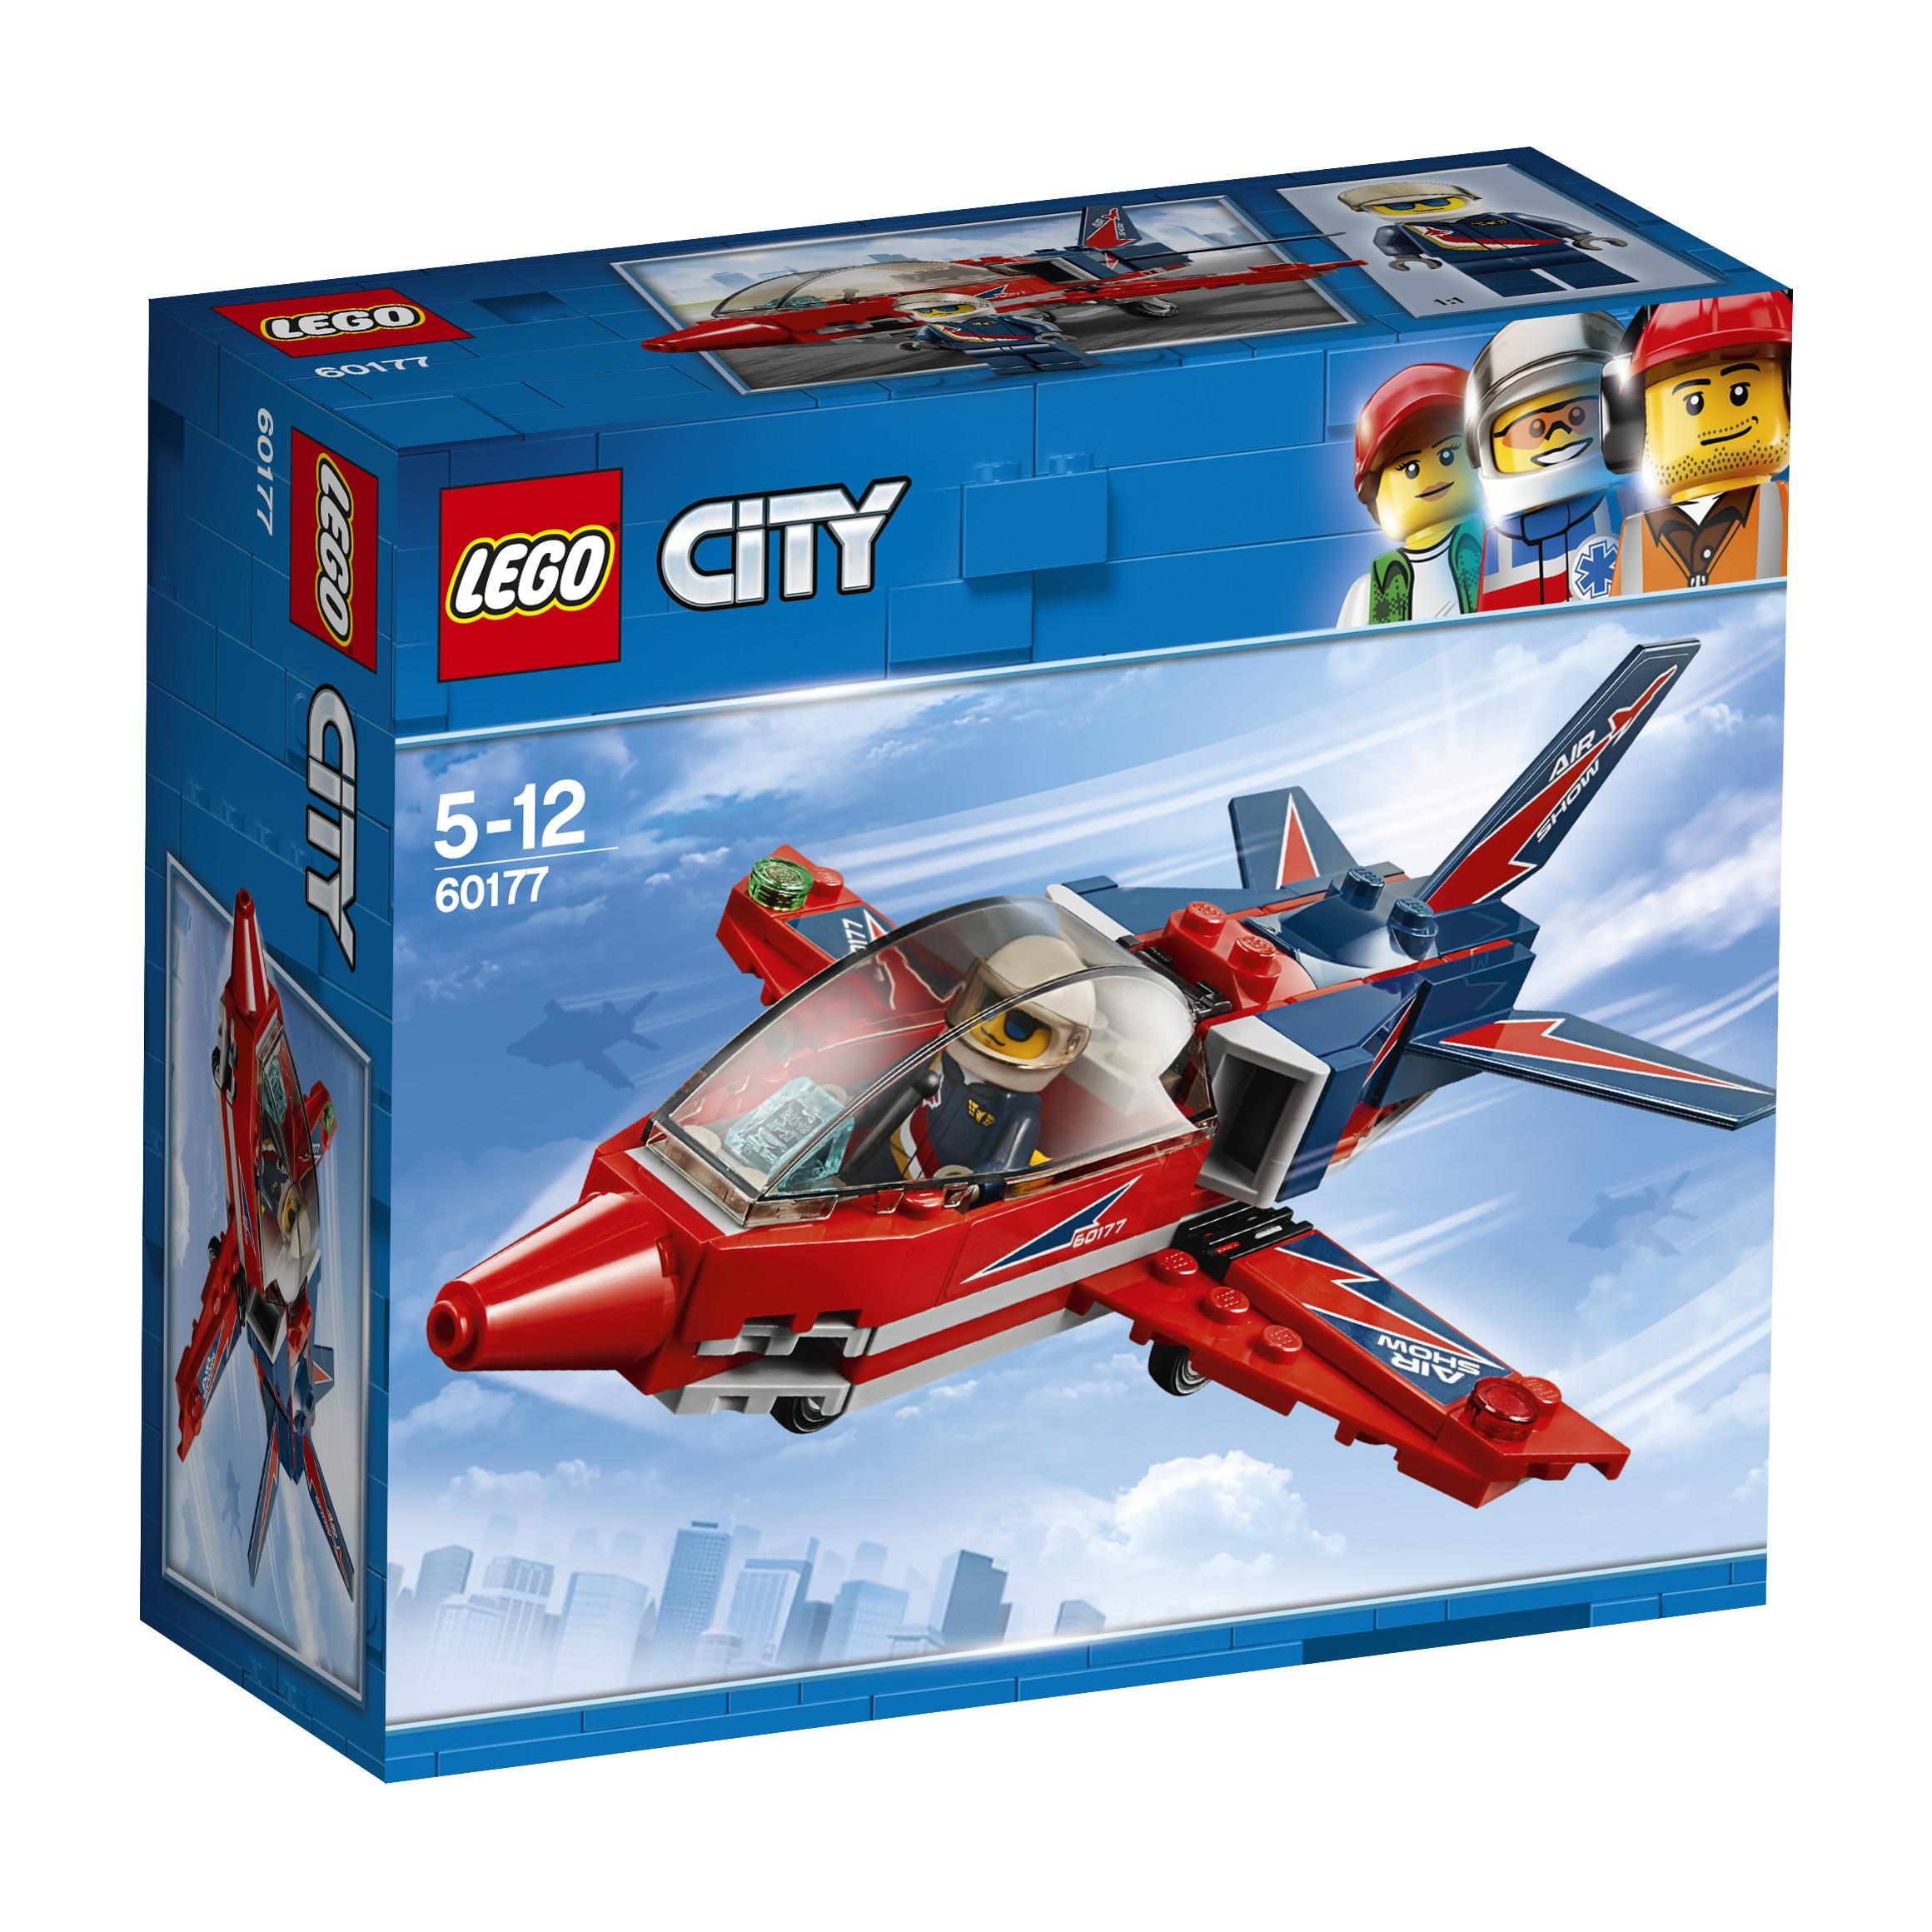 Конструктор LEGO City Great Vehicles 60177 Реактивный самолёт конструкторы lego lego city great vehicles рыболовный катер 60147